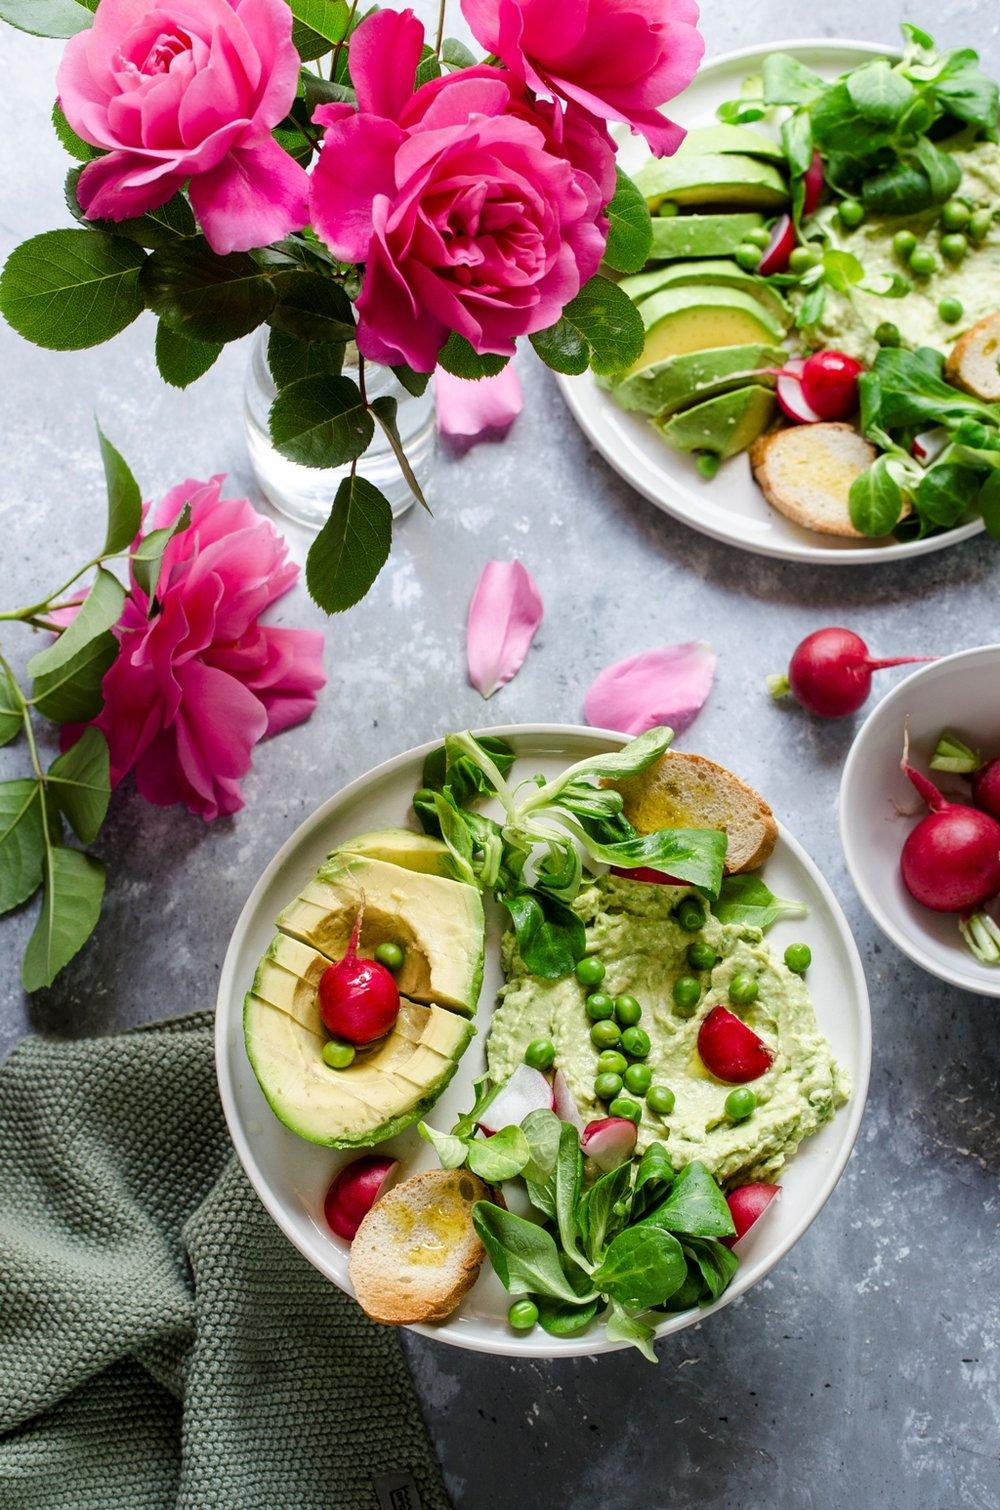 Pea hummus with avocado and radishes.jpg